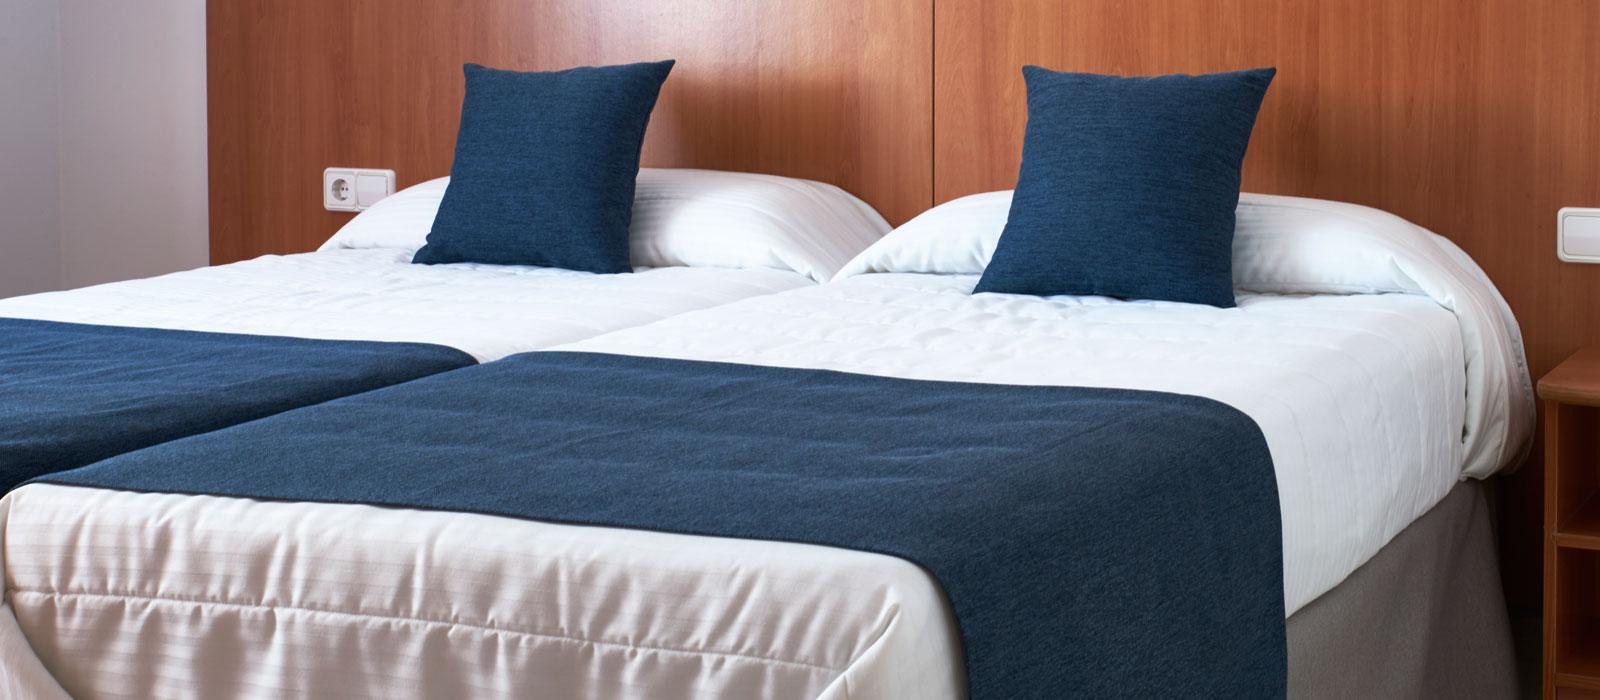 Apartamentos Checkin Beatrix | Pineda de Mar | Web Oficial